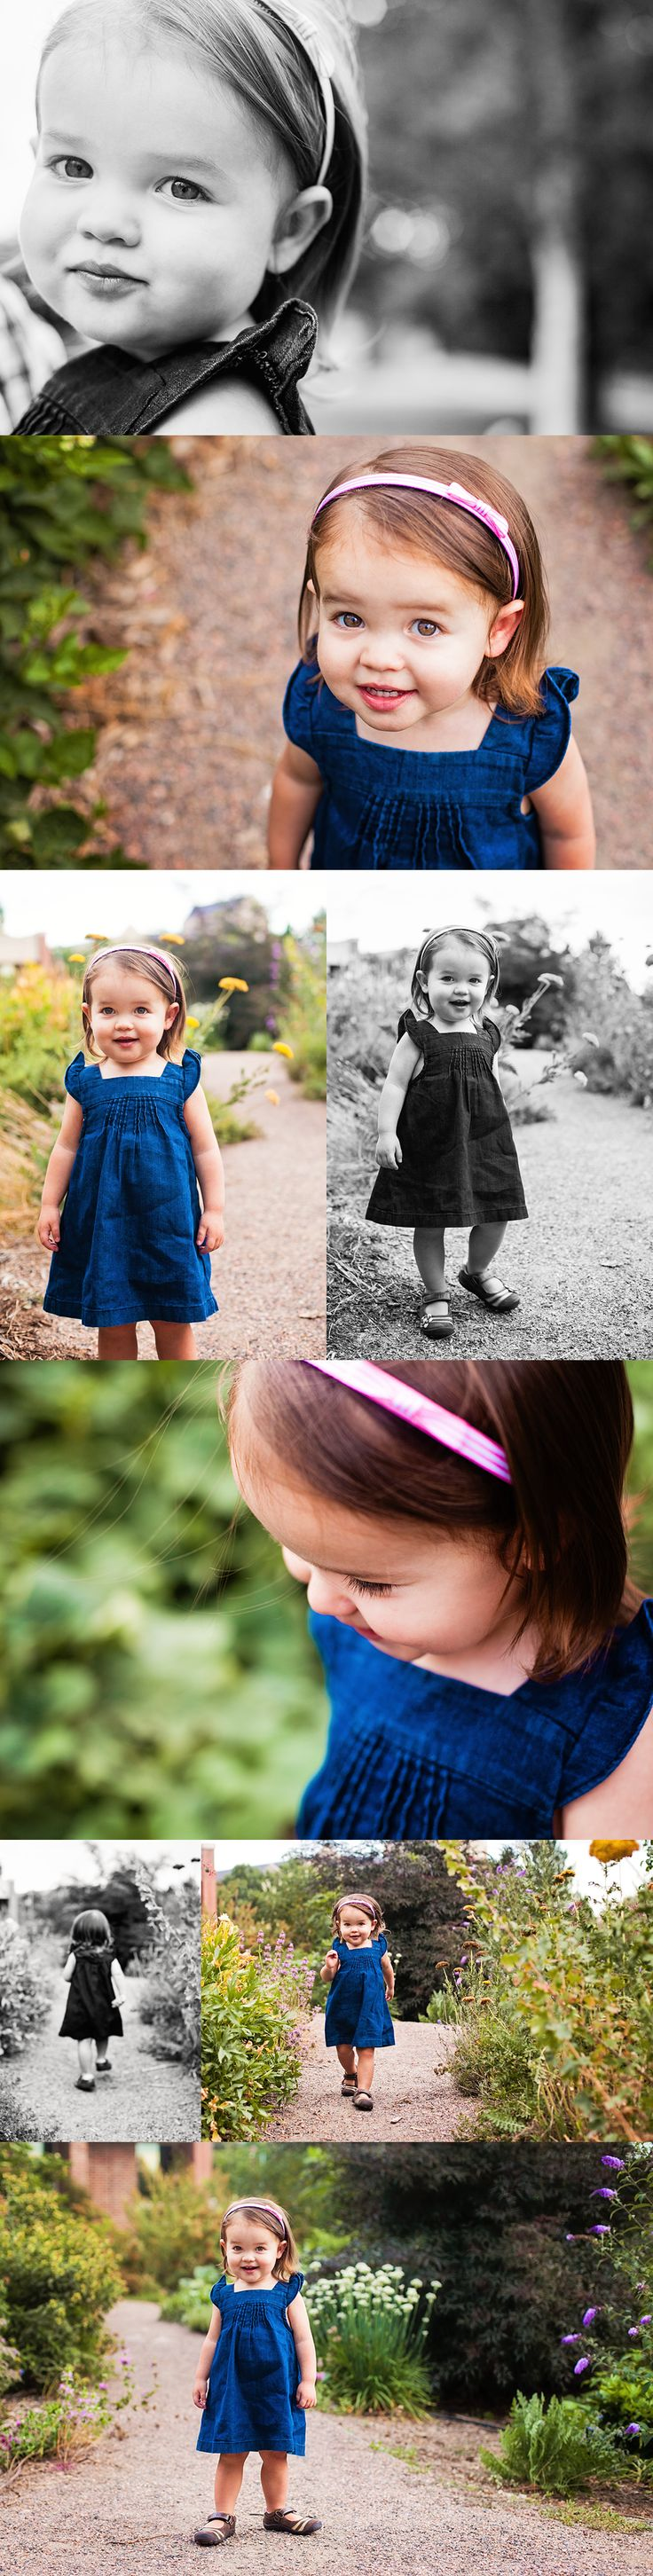 Two Year Old Portraits | Sara Garcia Photo Art